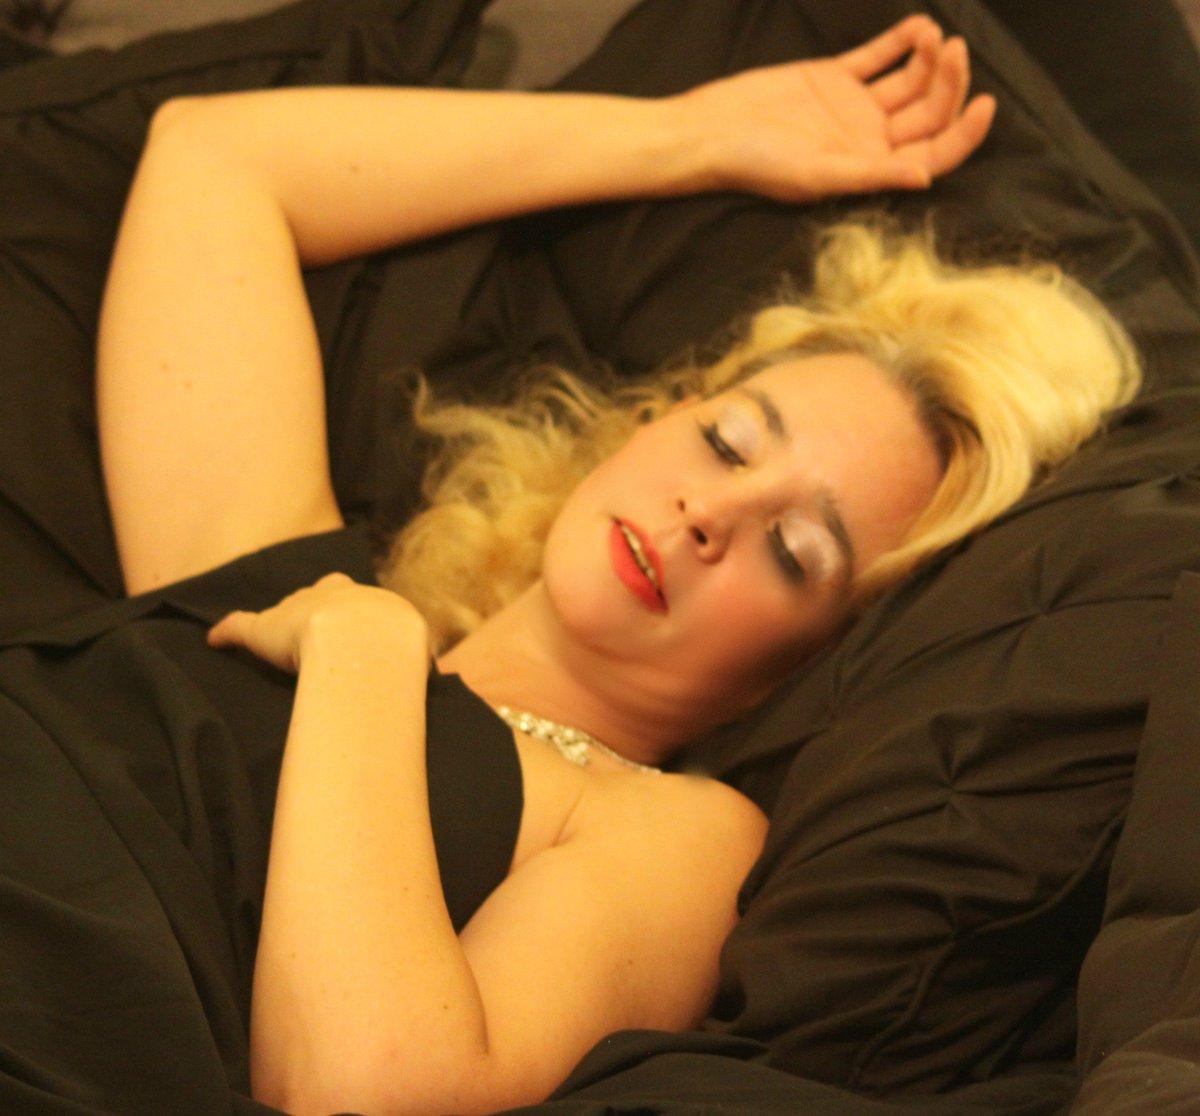 Goodnight Twitter.... sweet dreams #GFE #Companion #MILFMafia PqFvML3hh0 c